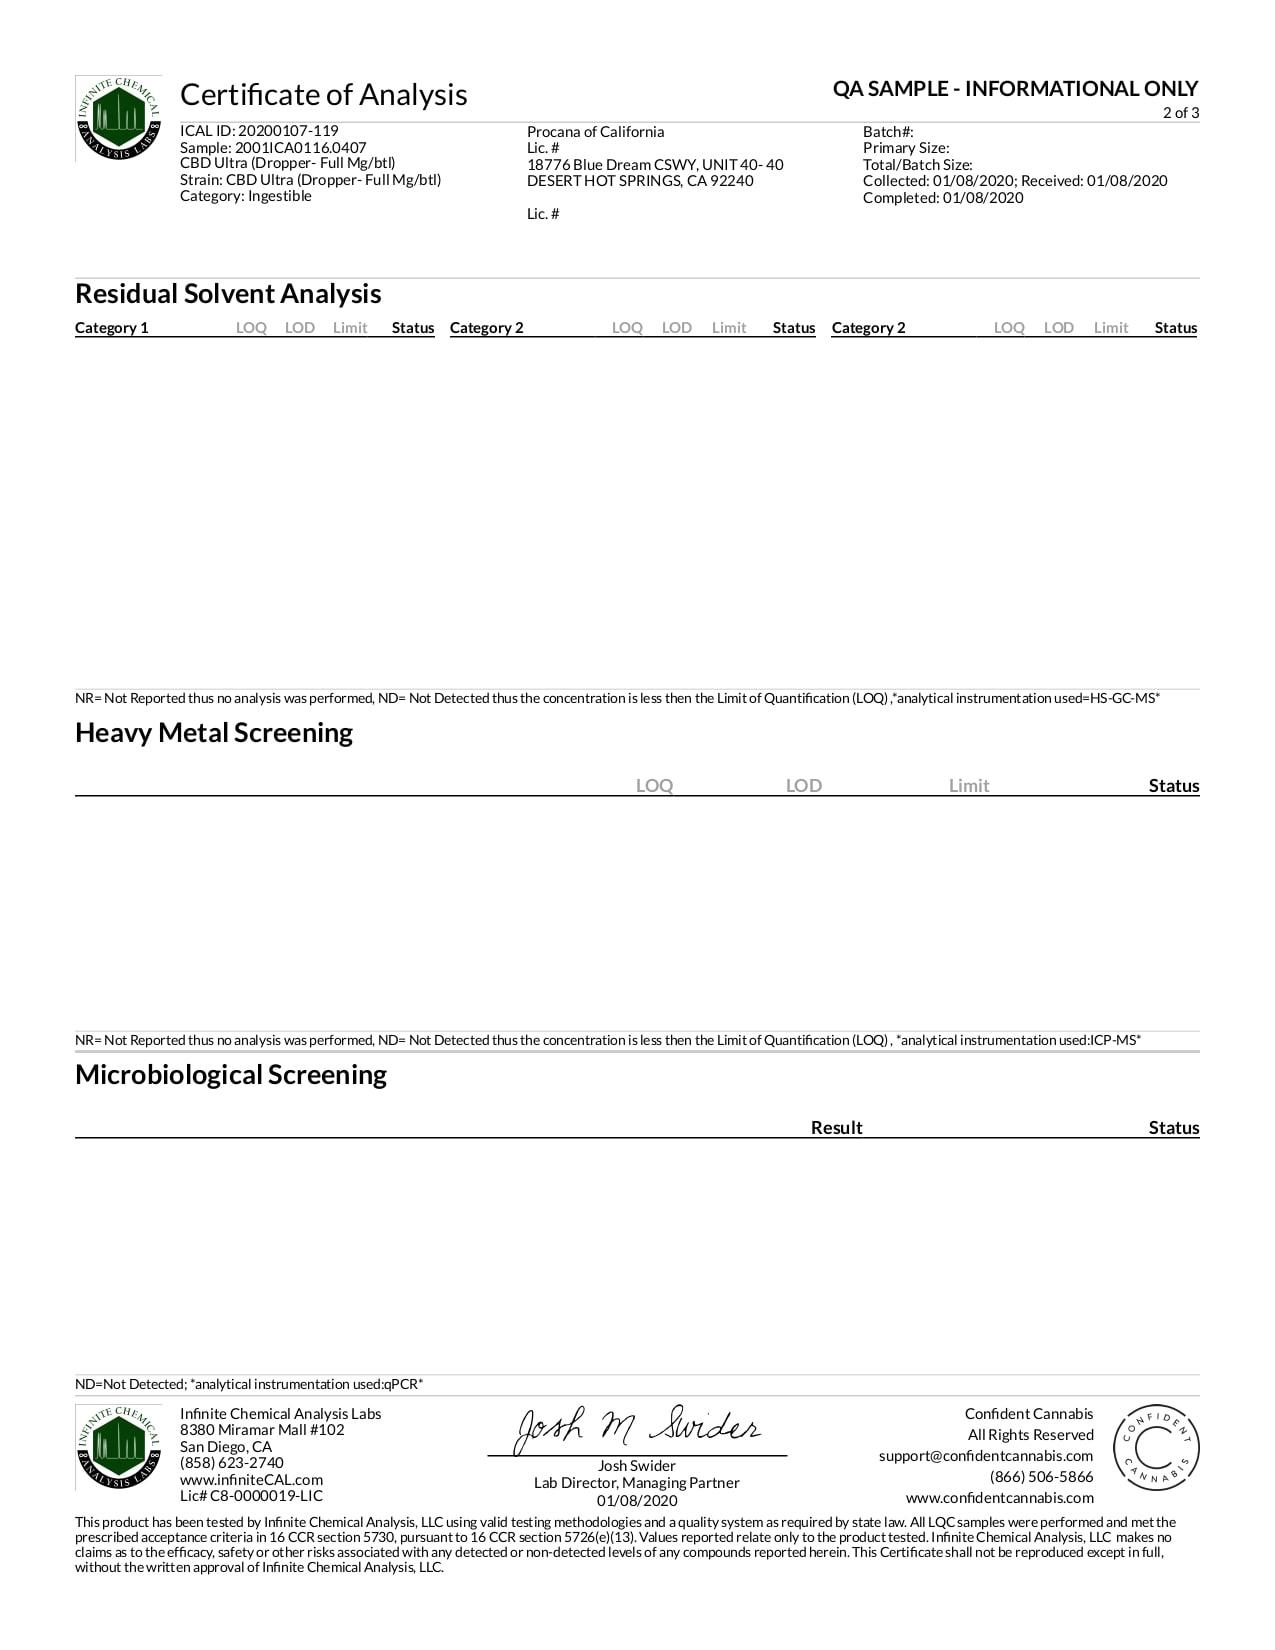 Procana CBD Tincture Ultra Lab Report 1500mg